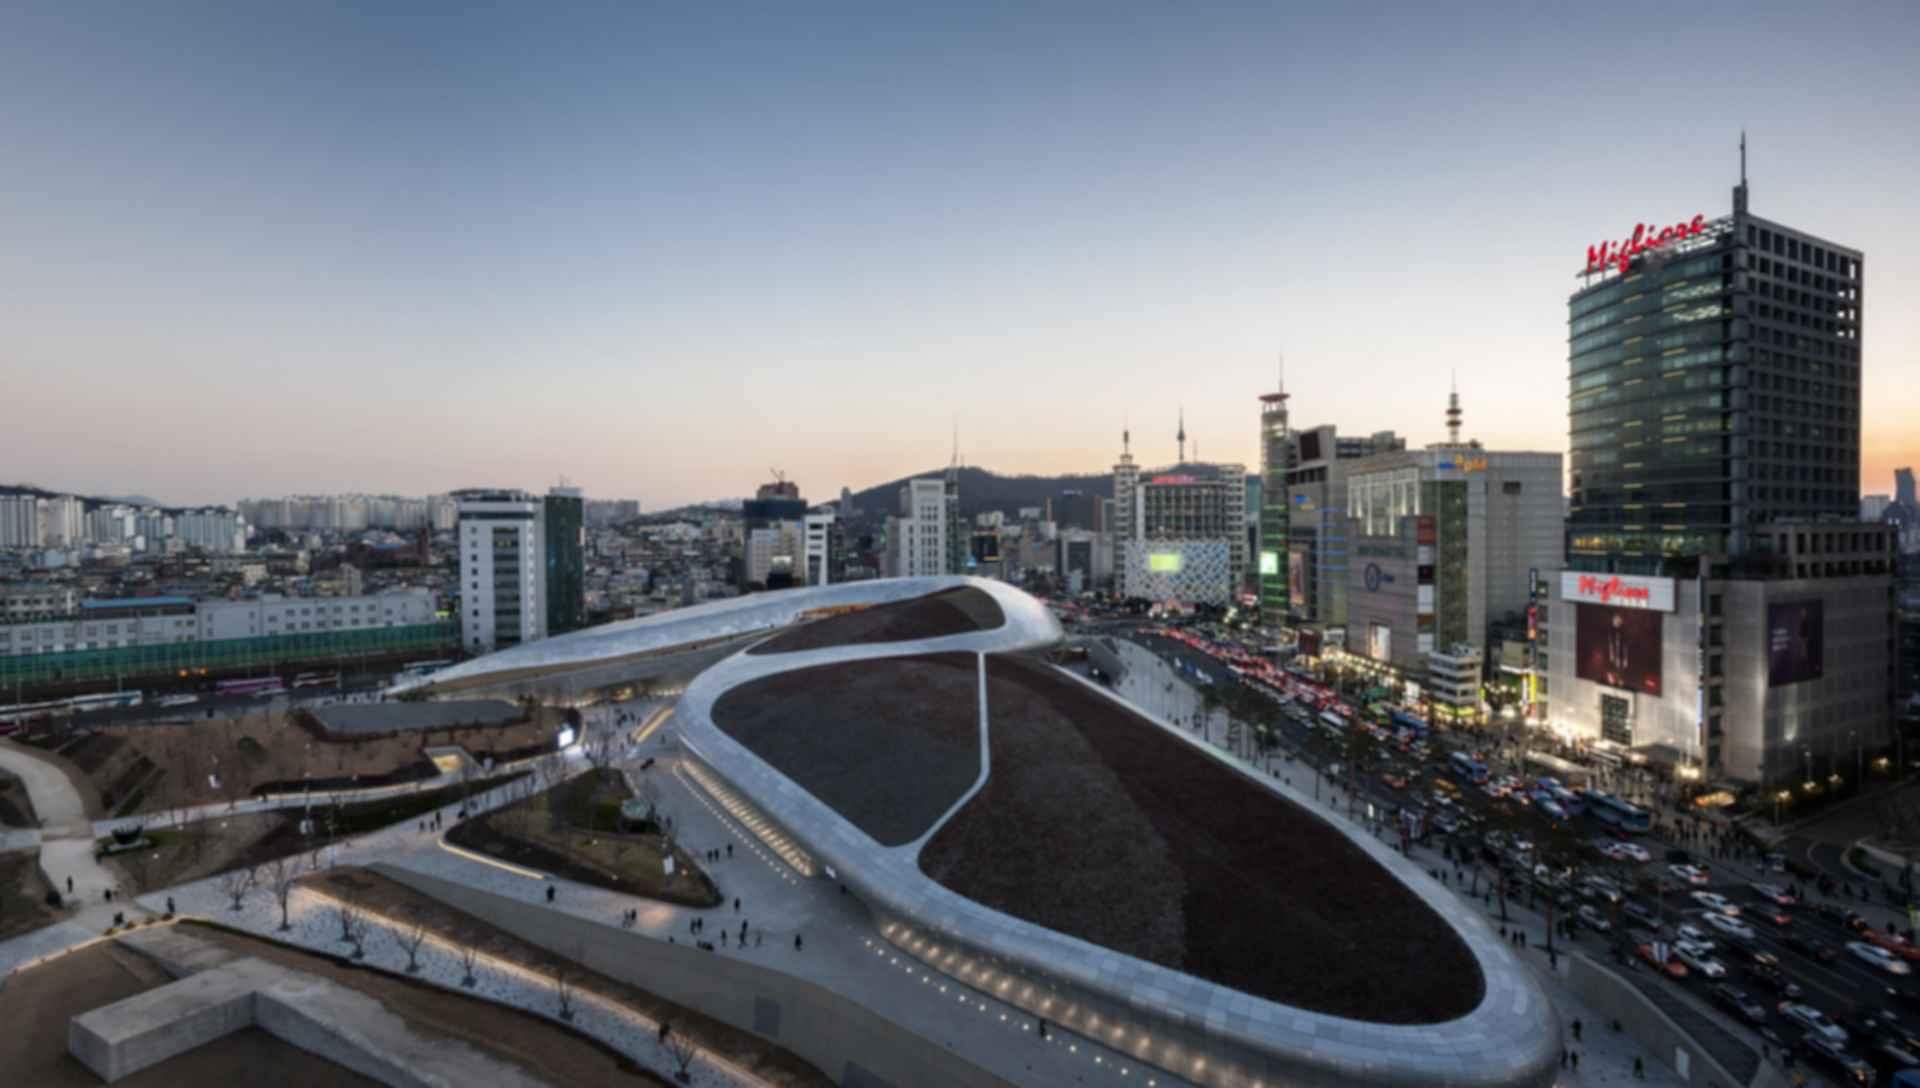 Dongdaemun Design Plaza  Concept Design  modlarcom